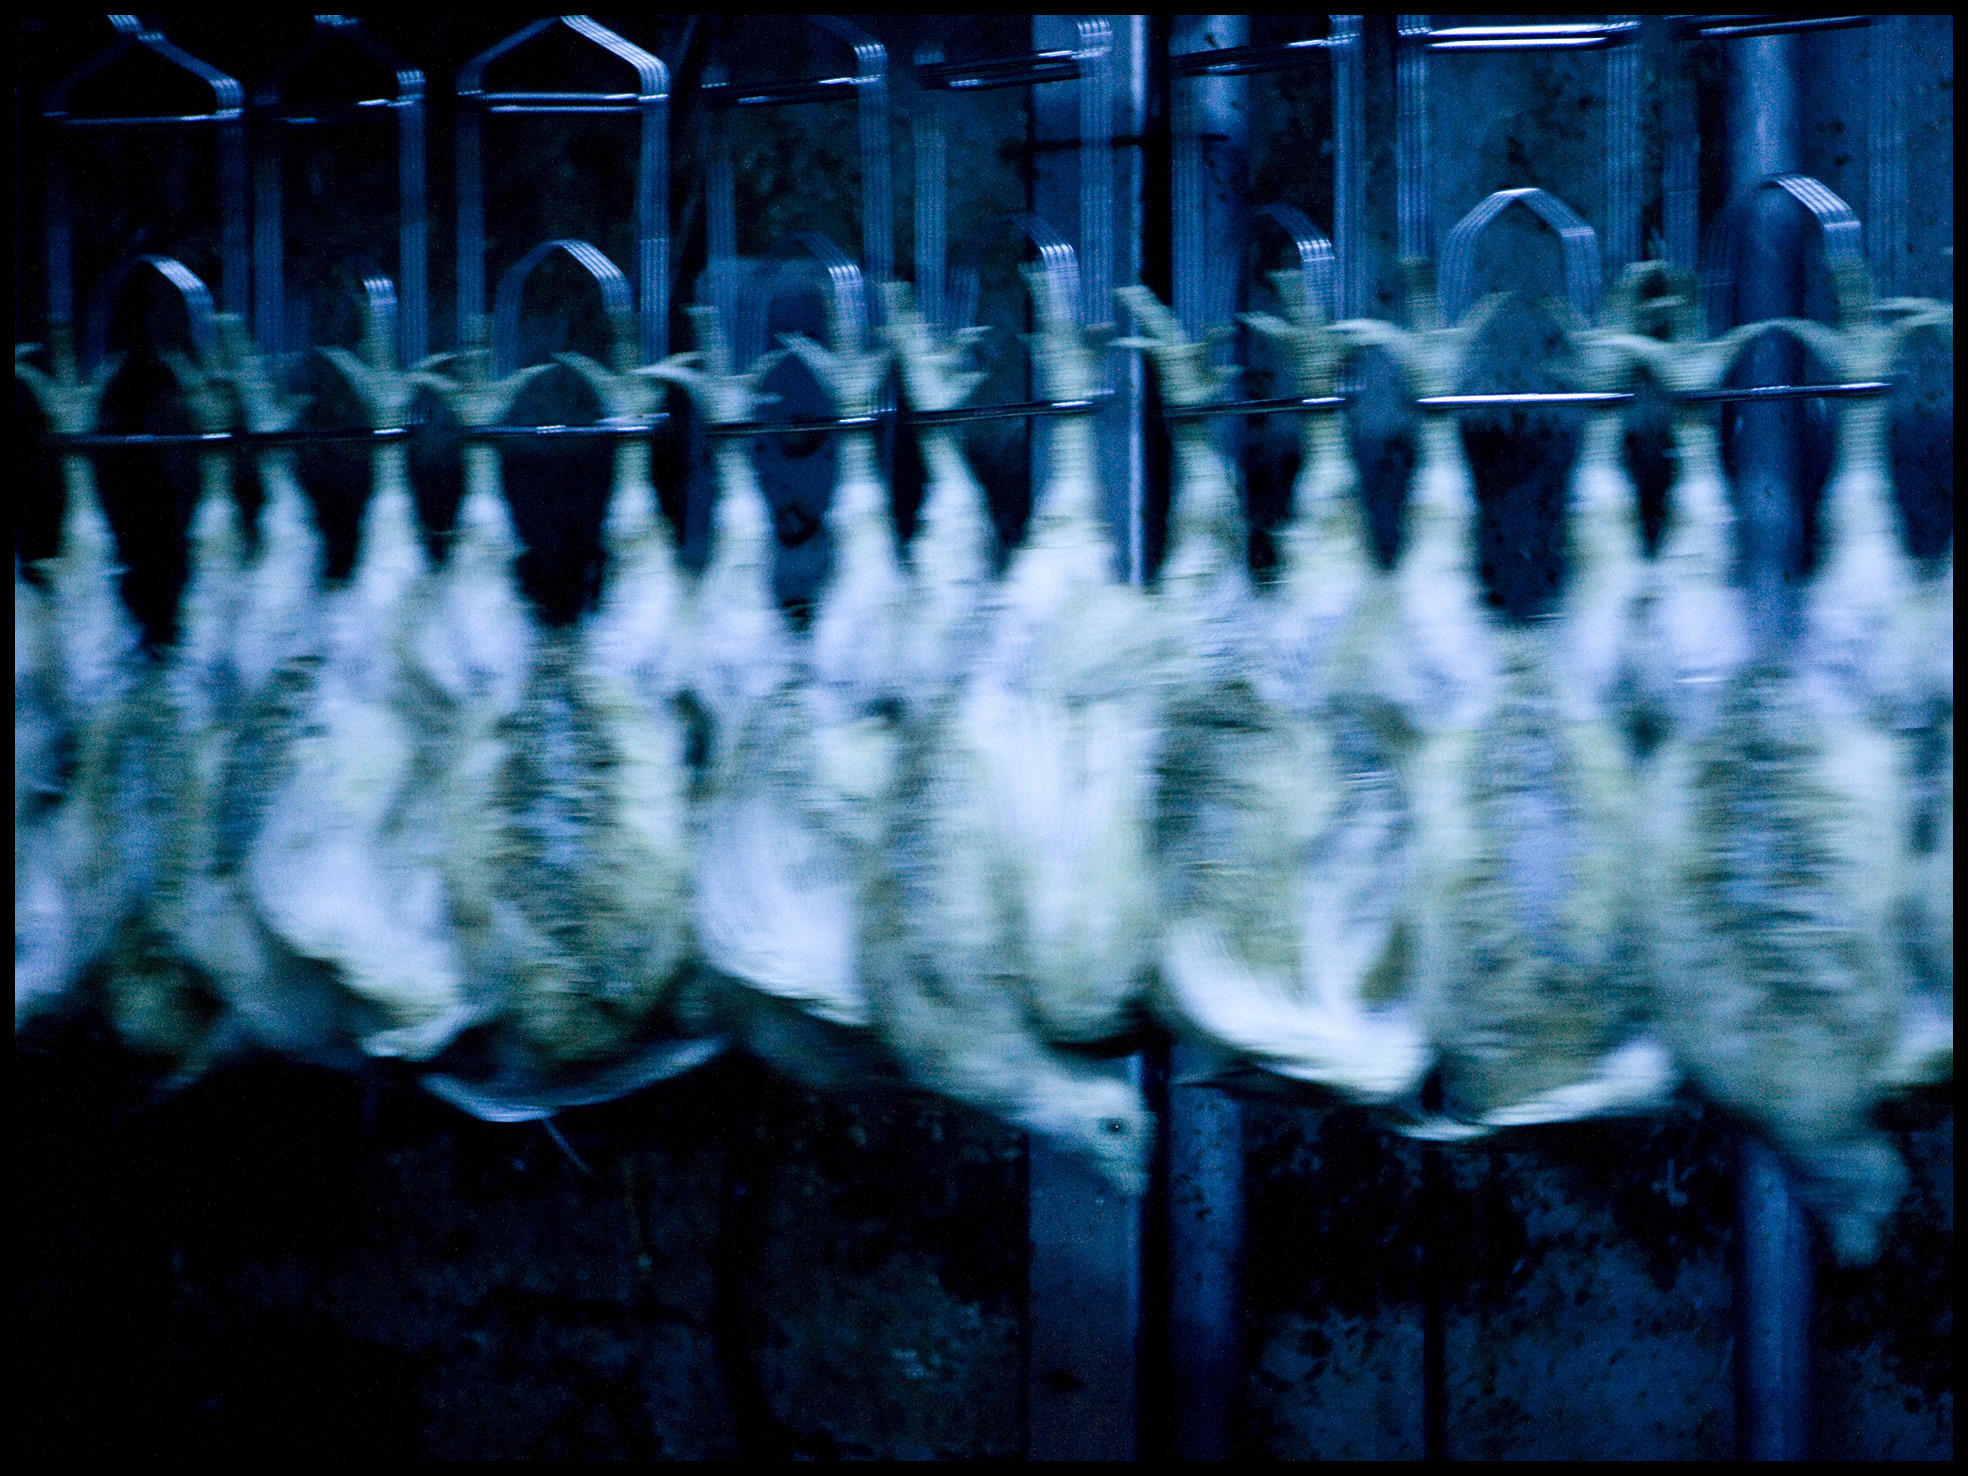 The Manor Farm Chicken Processing Plant